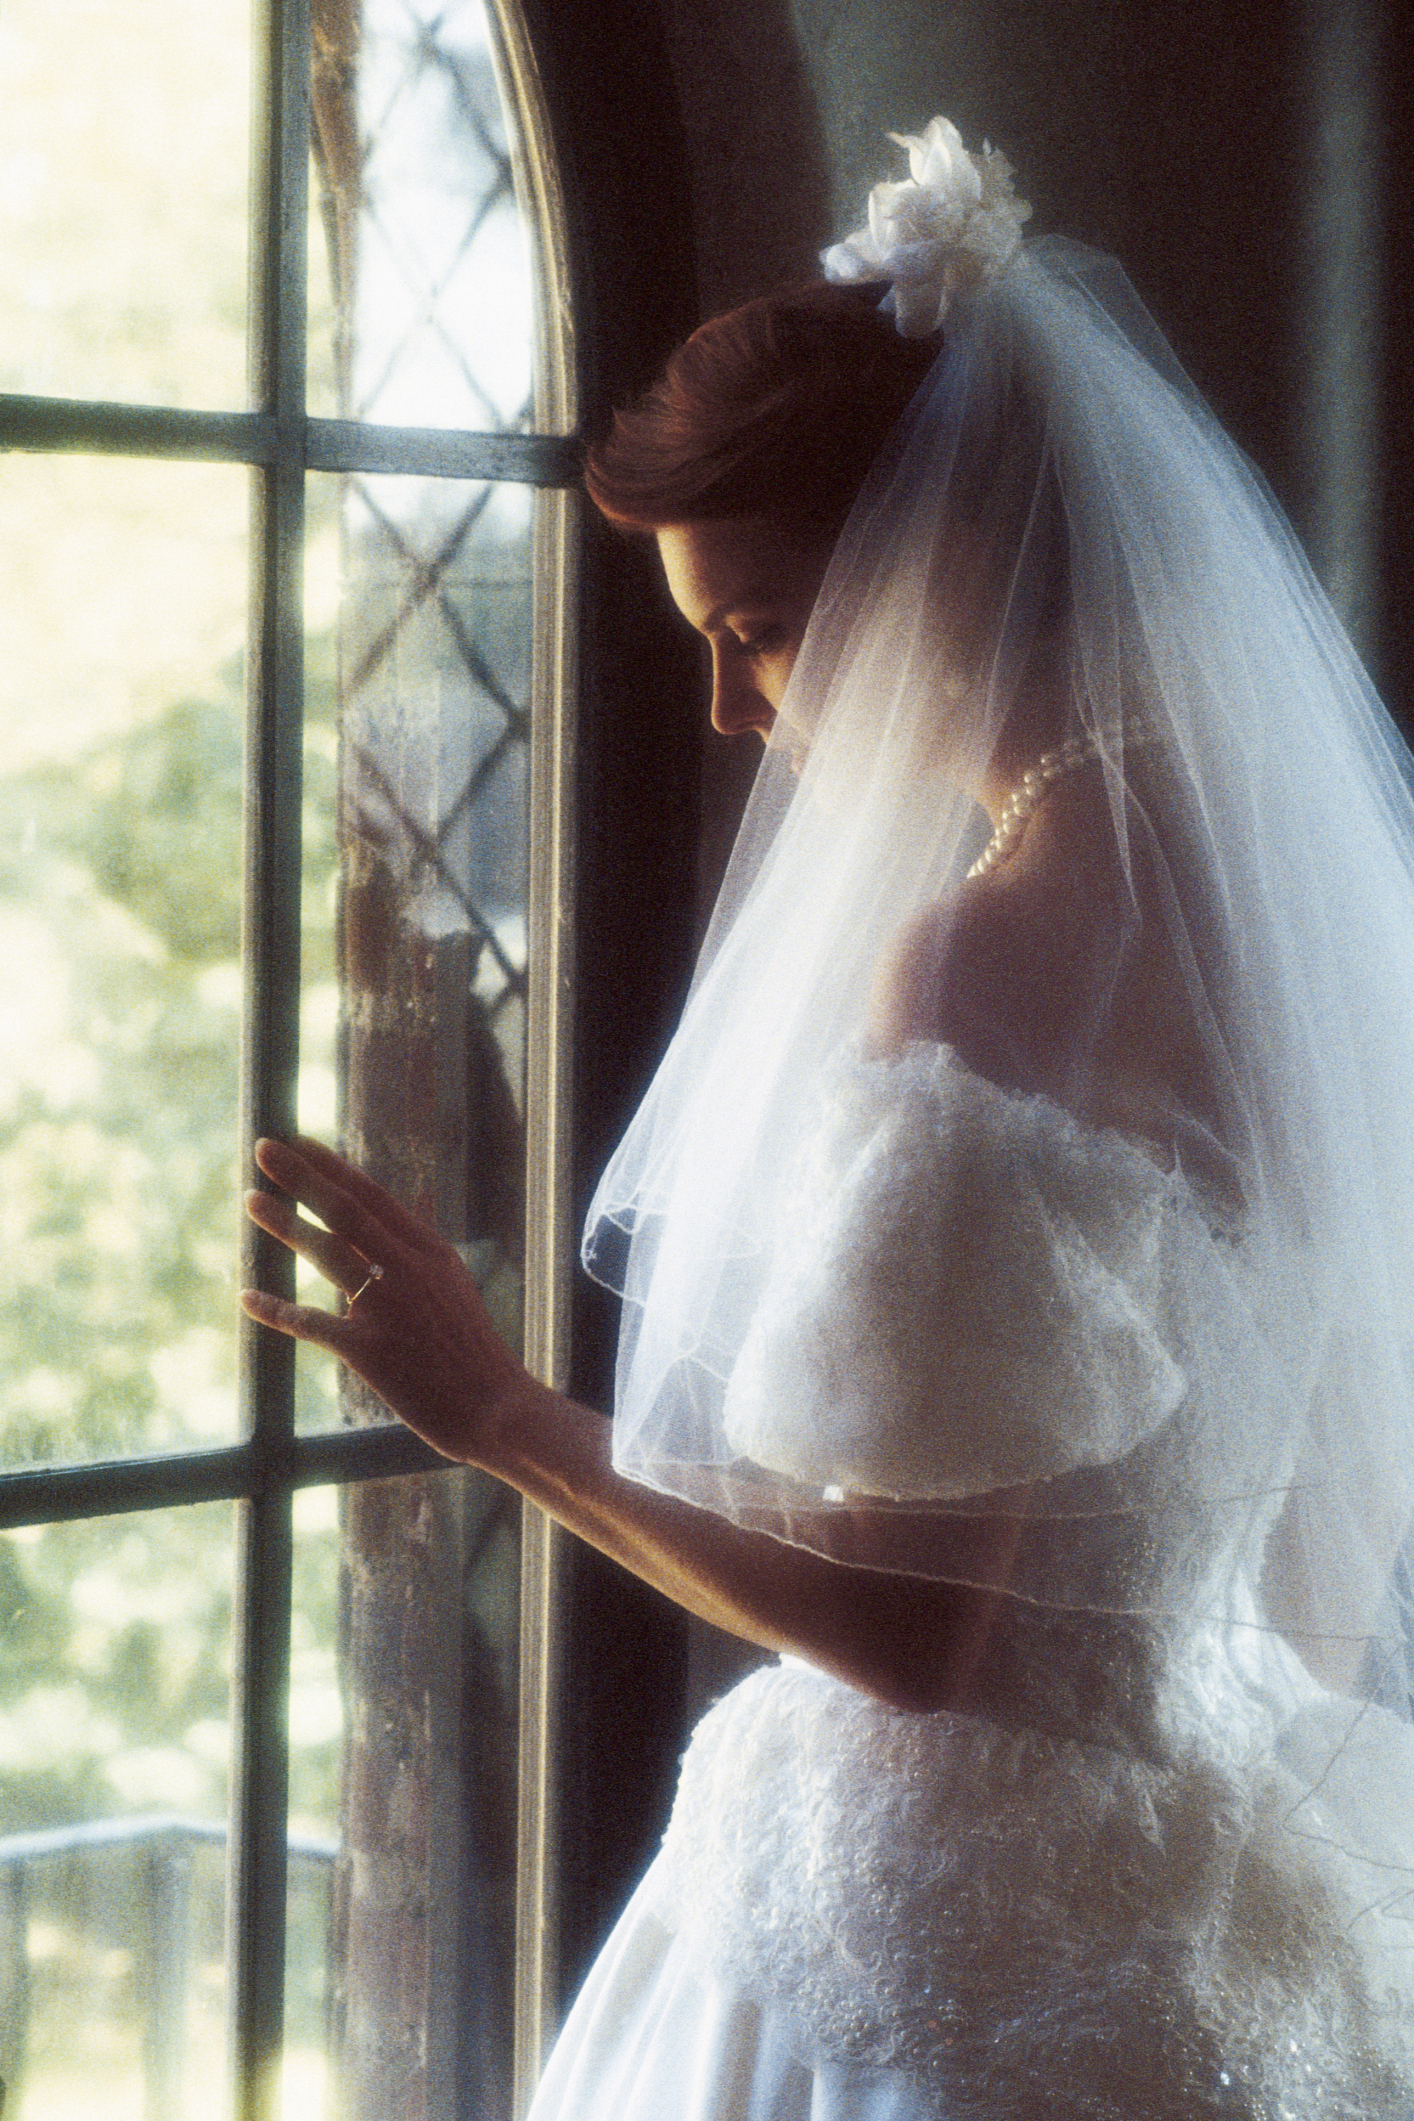 Bride Amp Groom Dress Etiquette For A Catholic Wedding Our